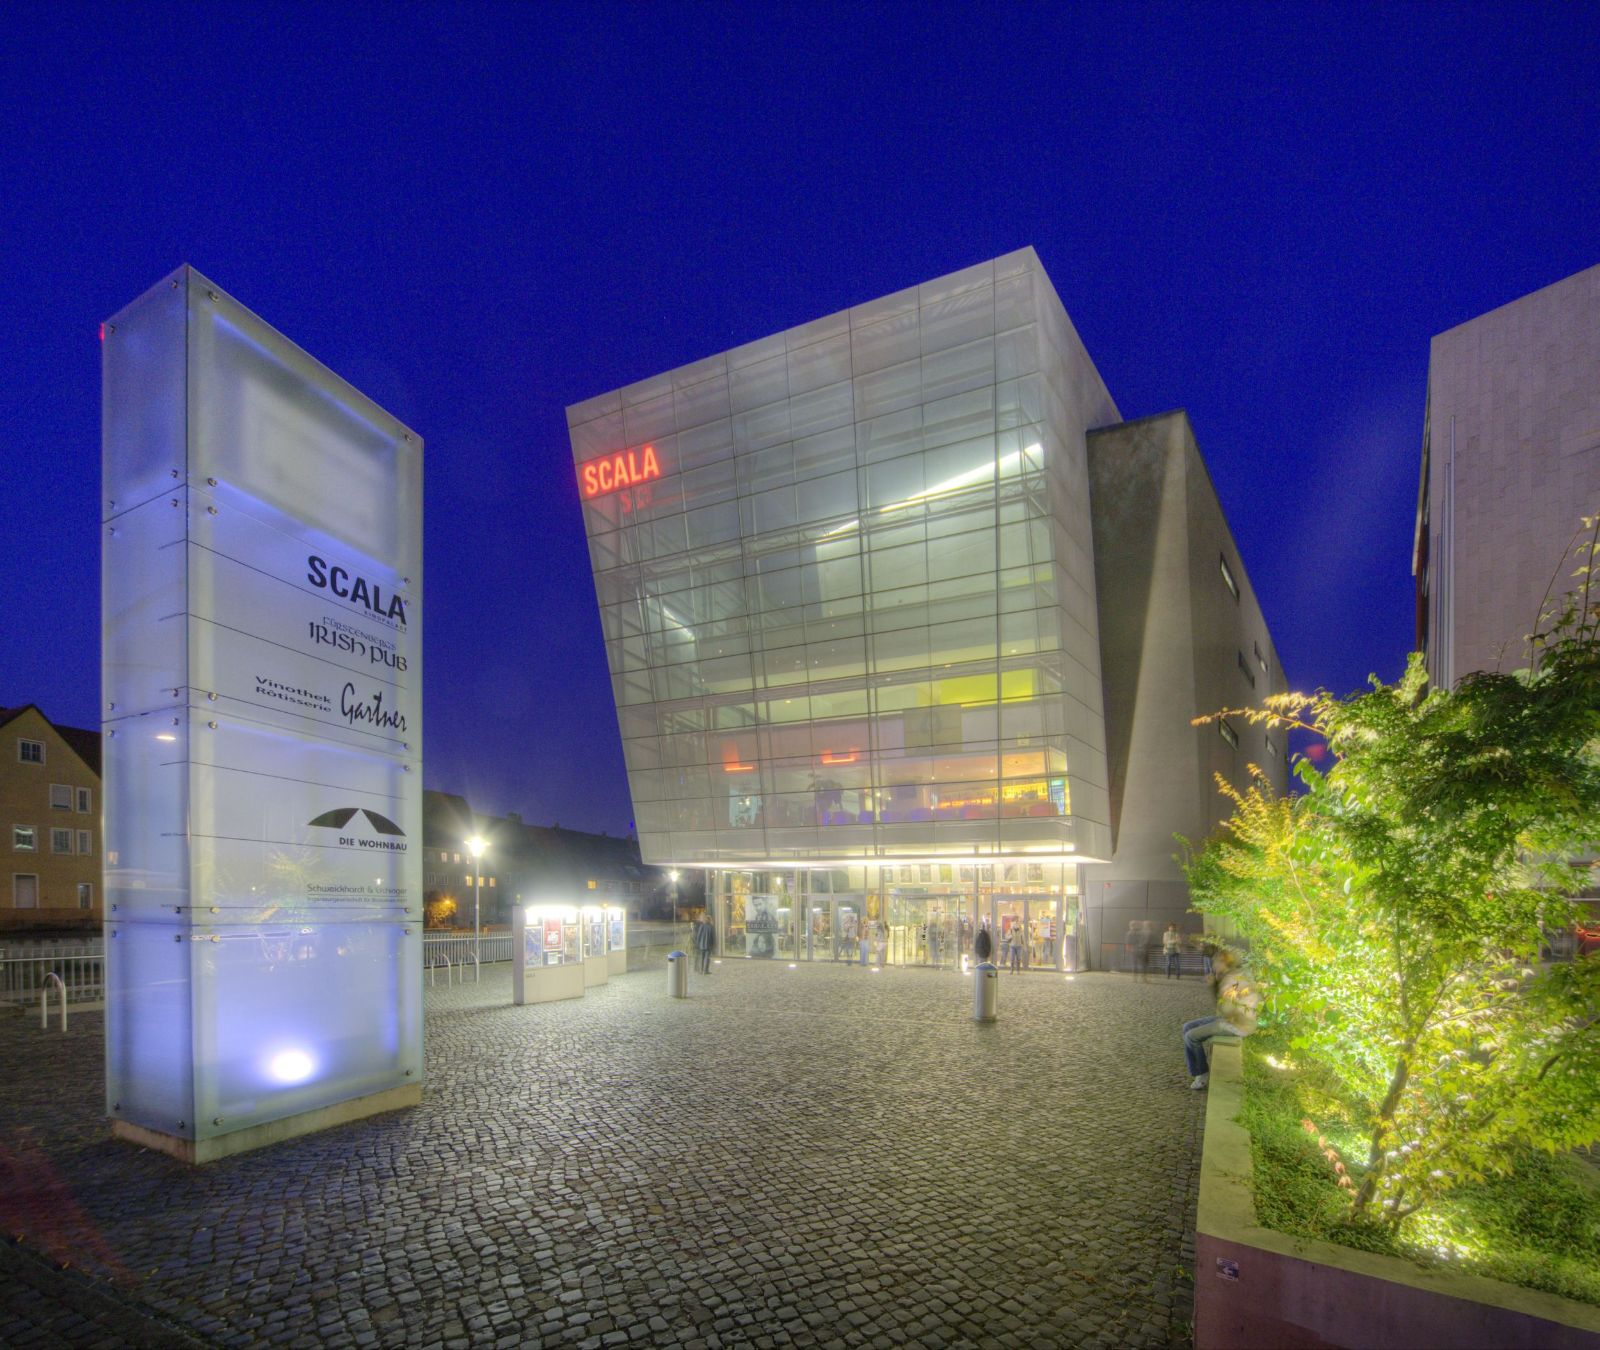 Scala Kino bei Nacht _Frontansicht